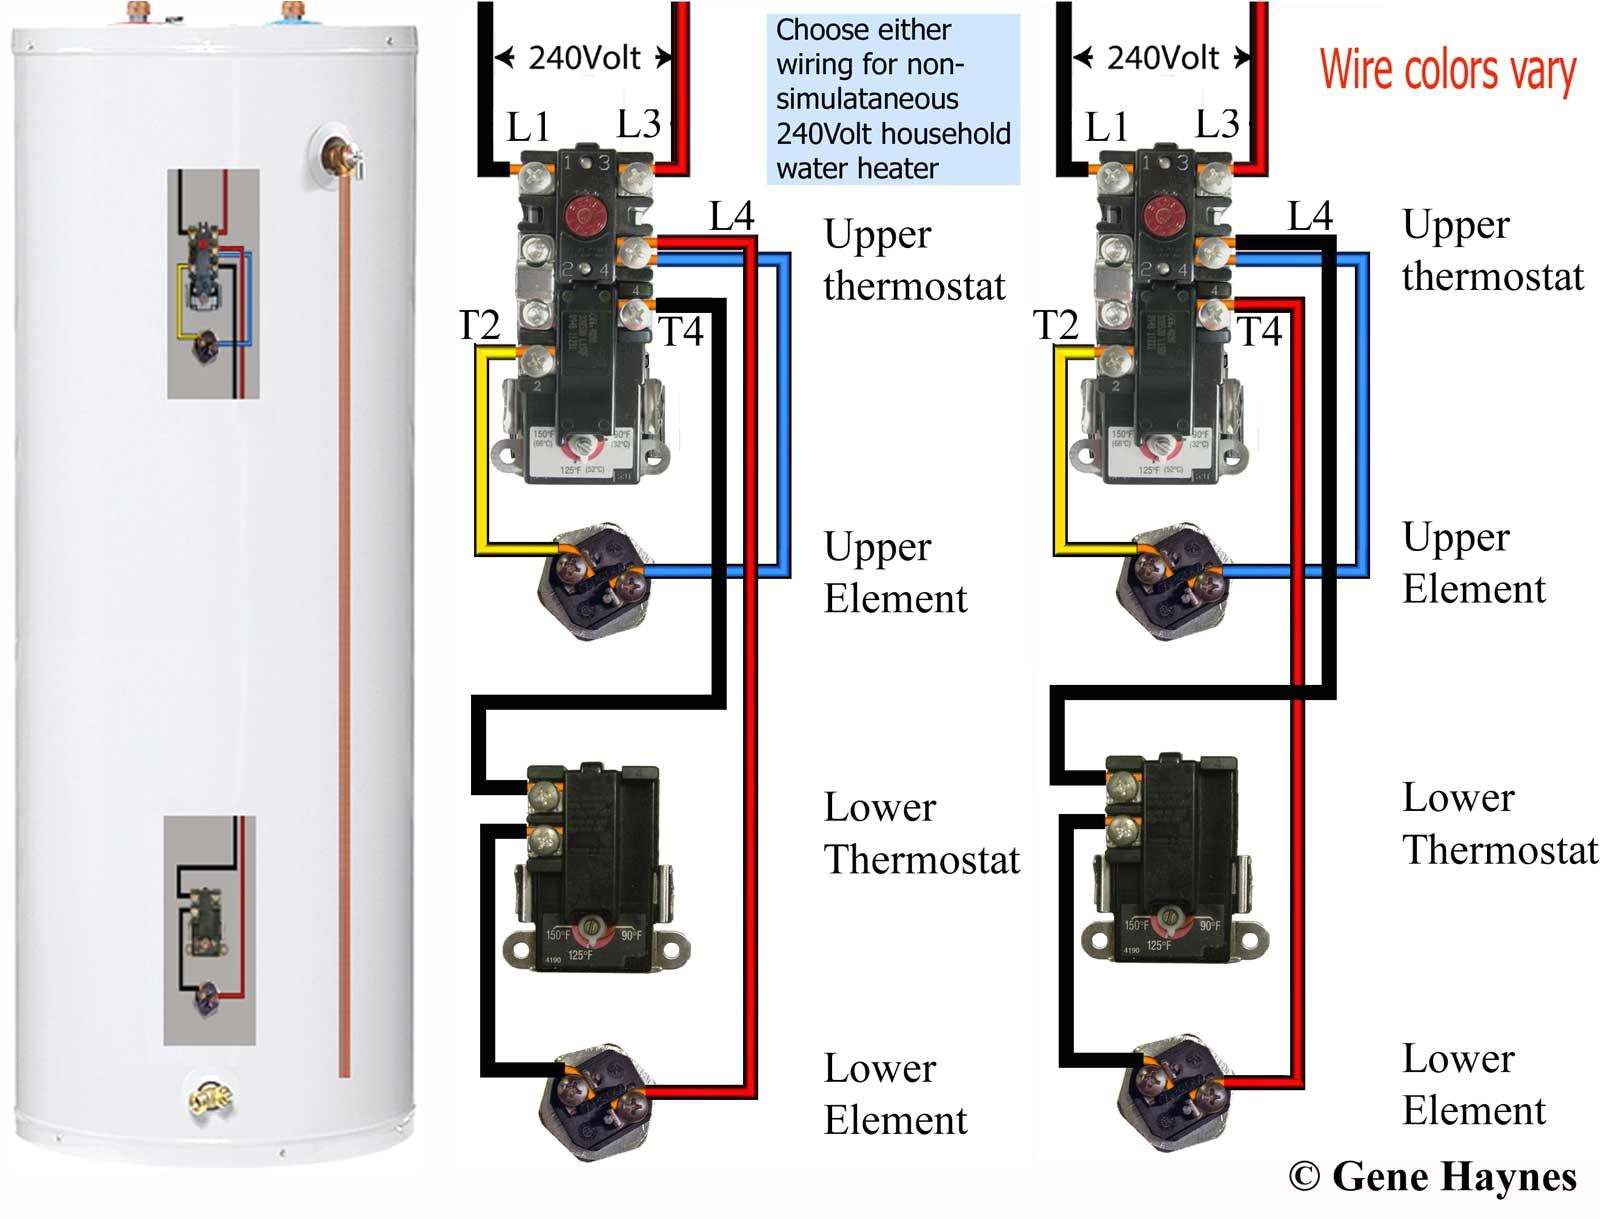 Whirlpool energy smart water heater manual